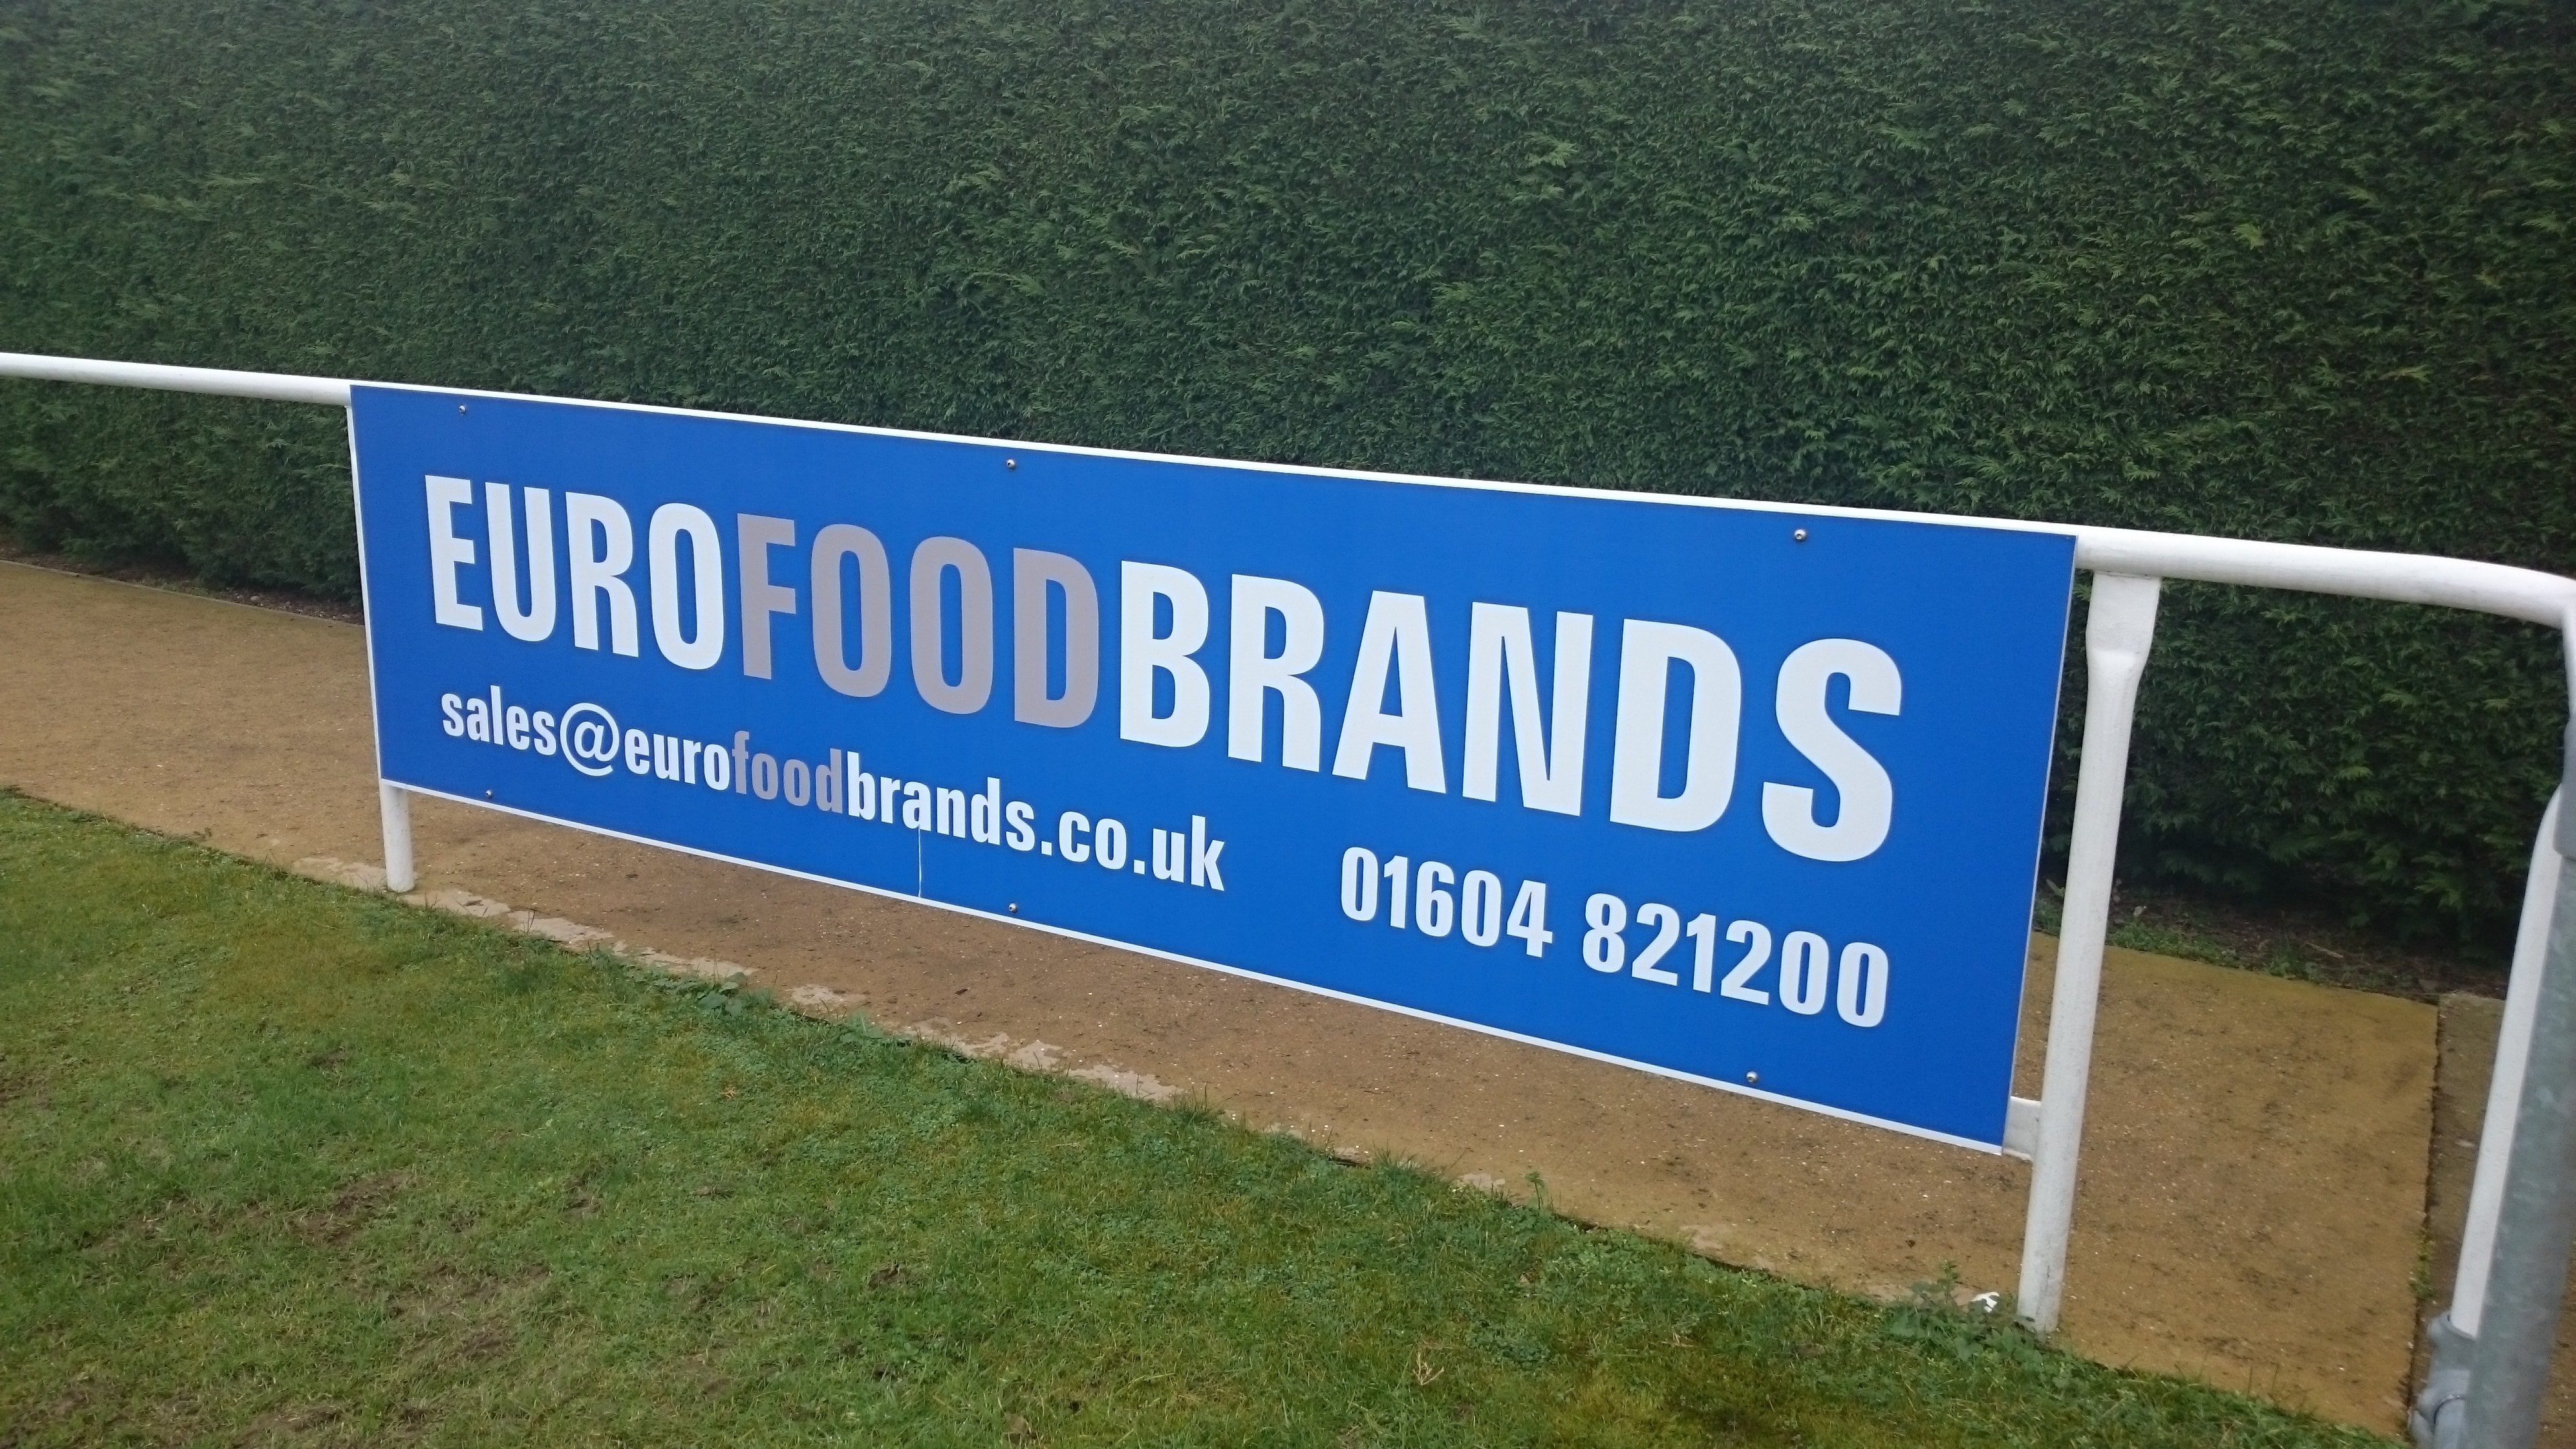 Euro Food Brands